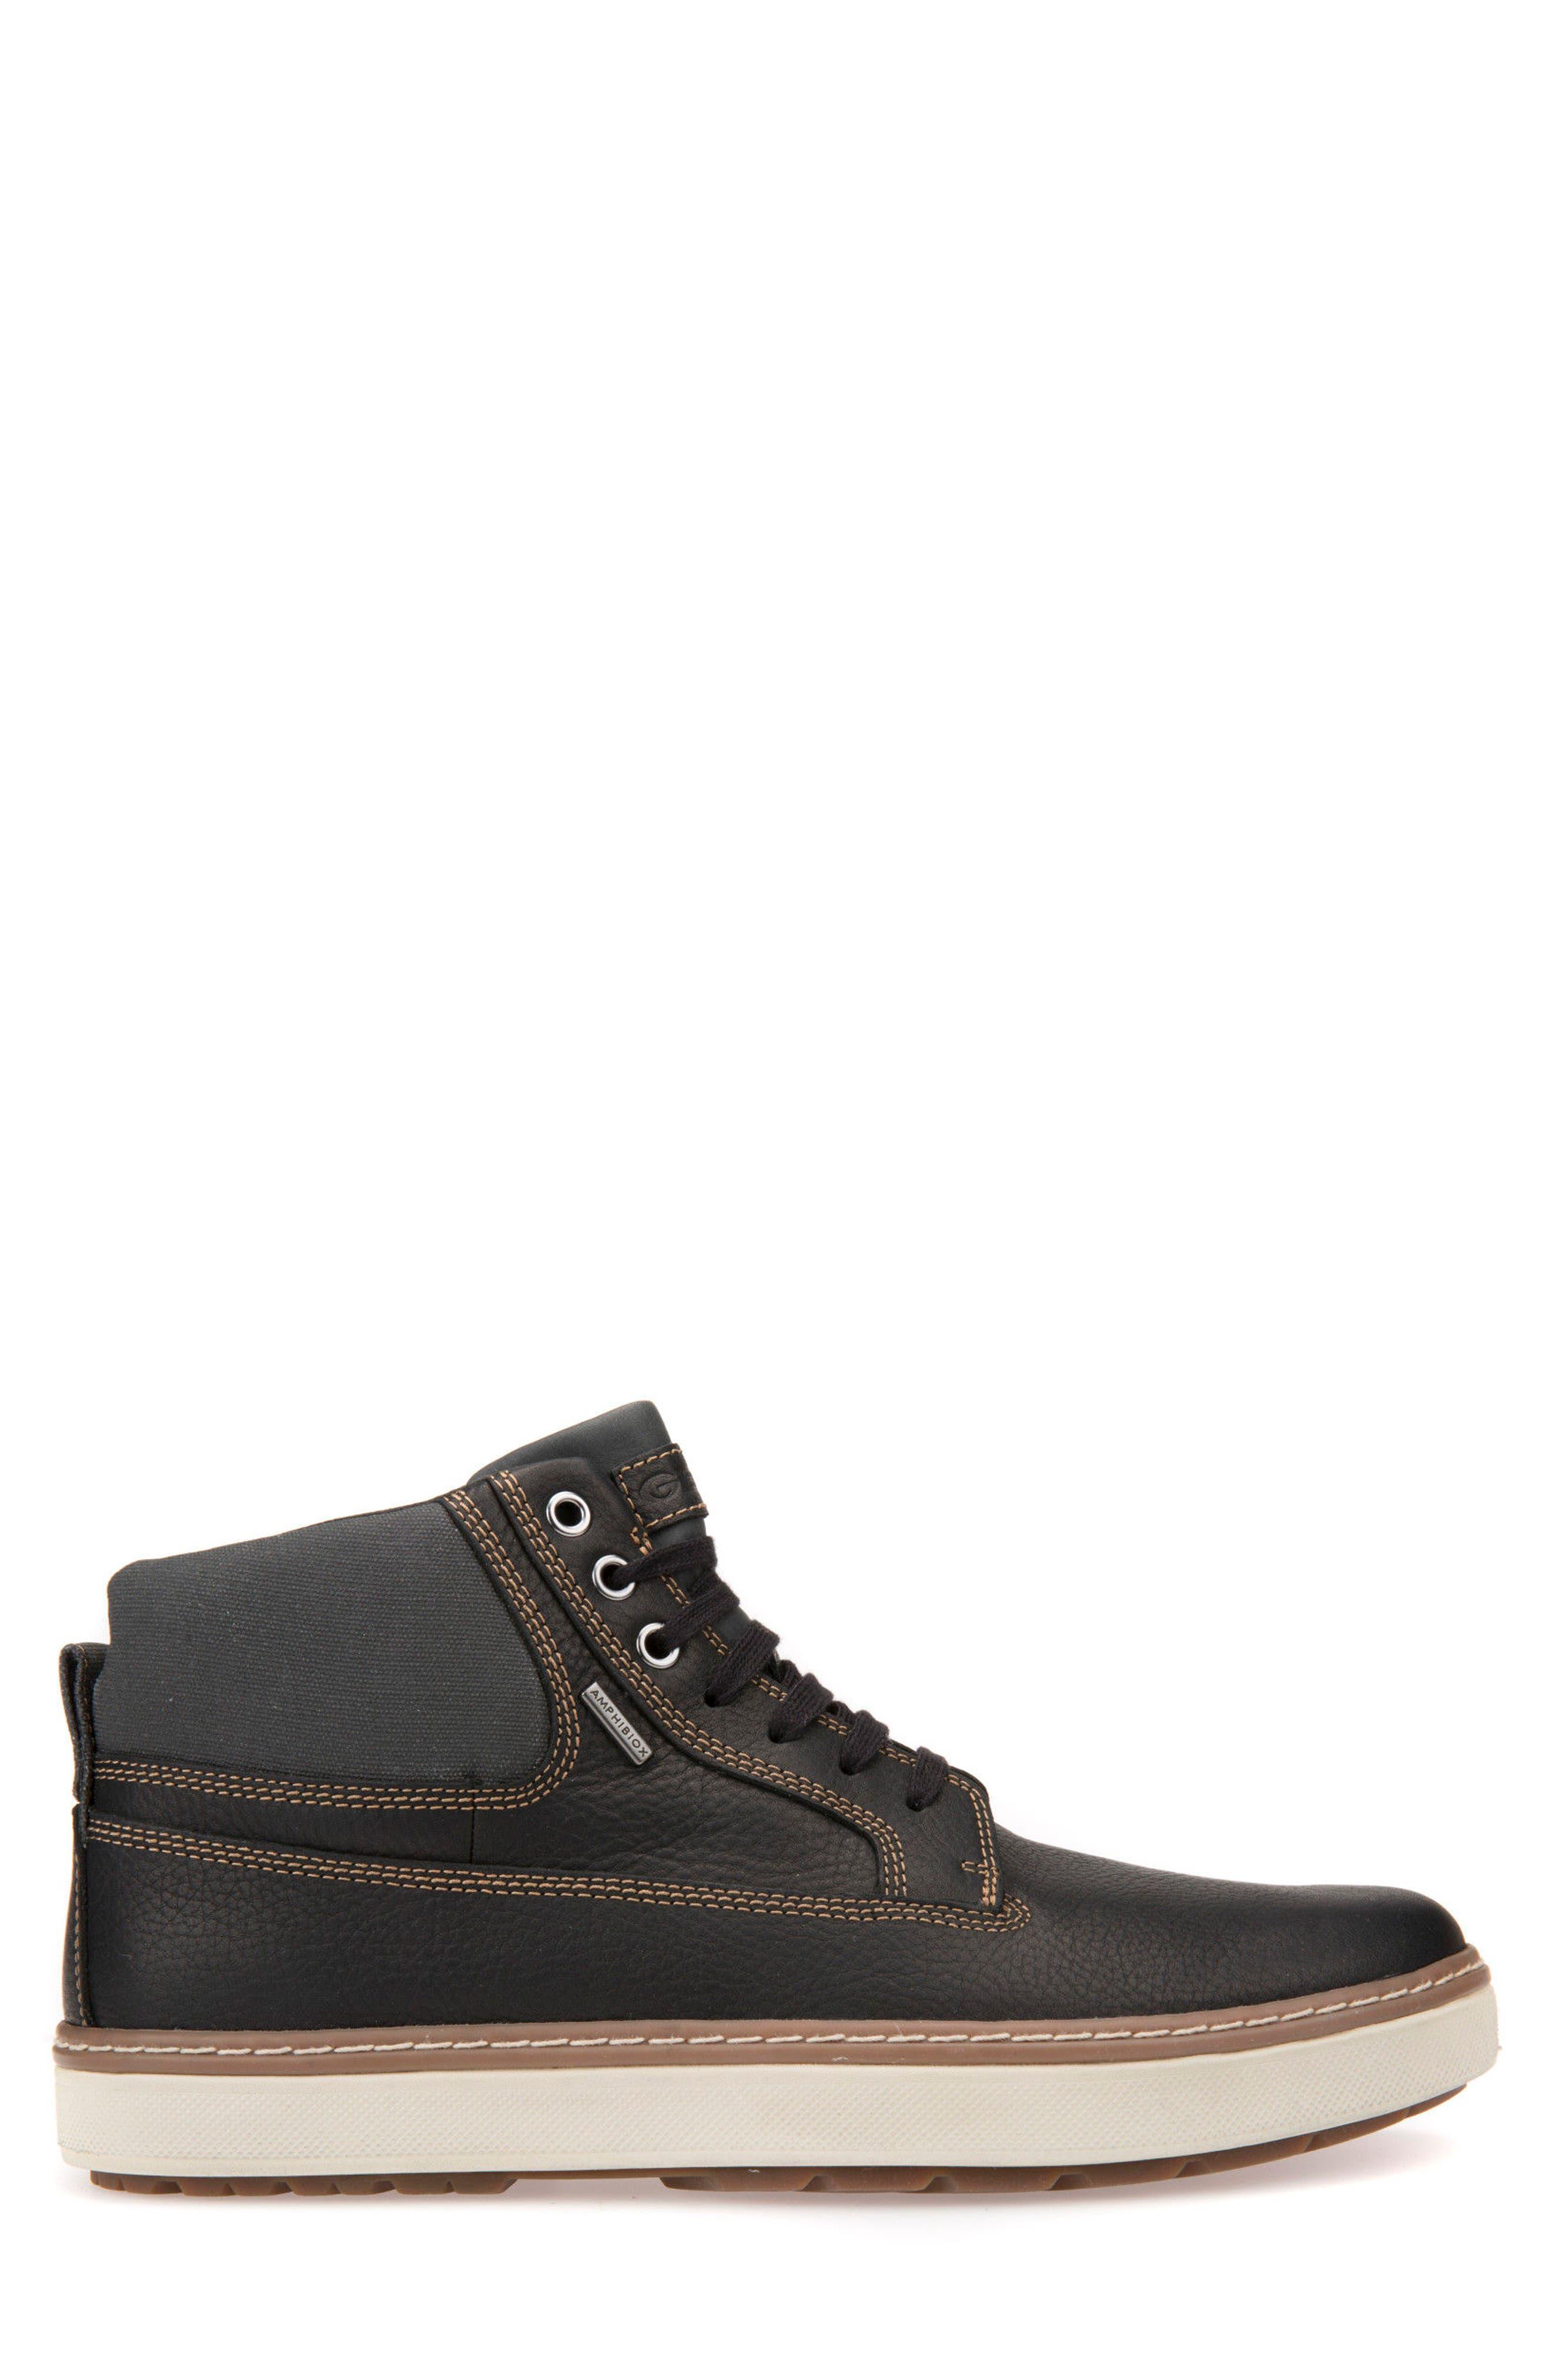 Mattias B ABX Waterproof Sneaker Boot,                             Alternate thumbnail 3, color,